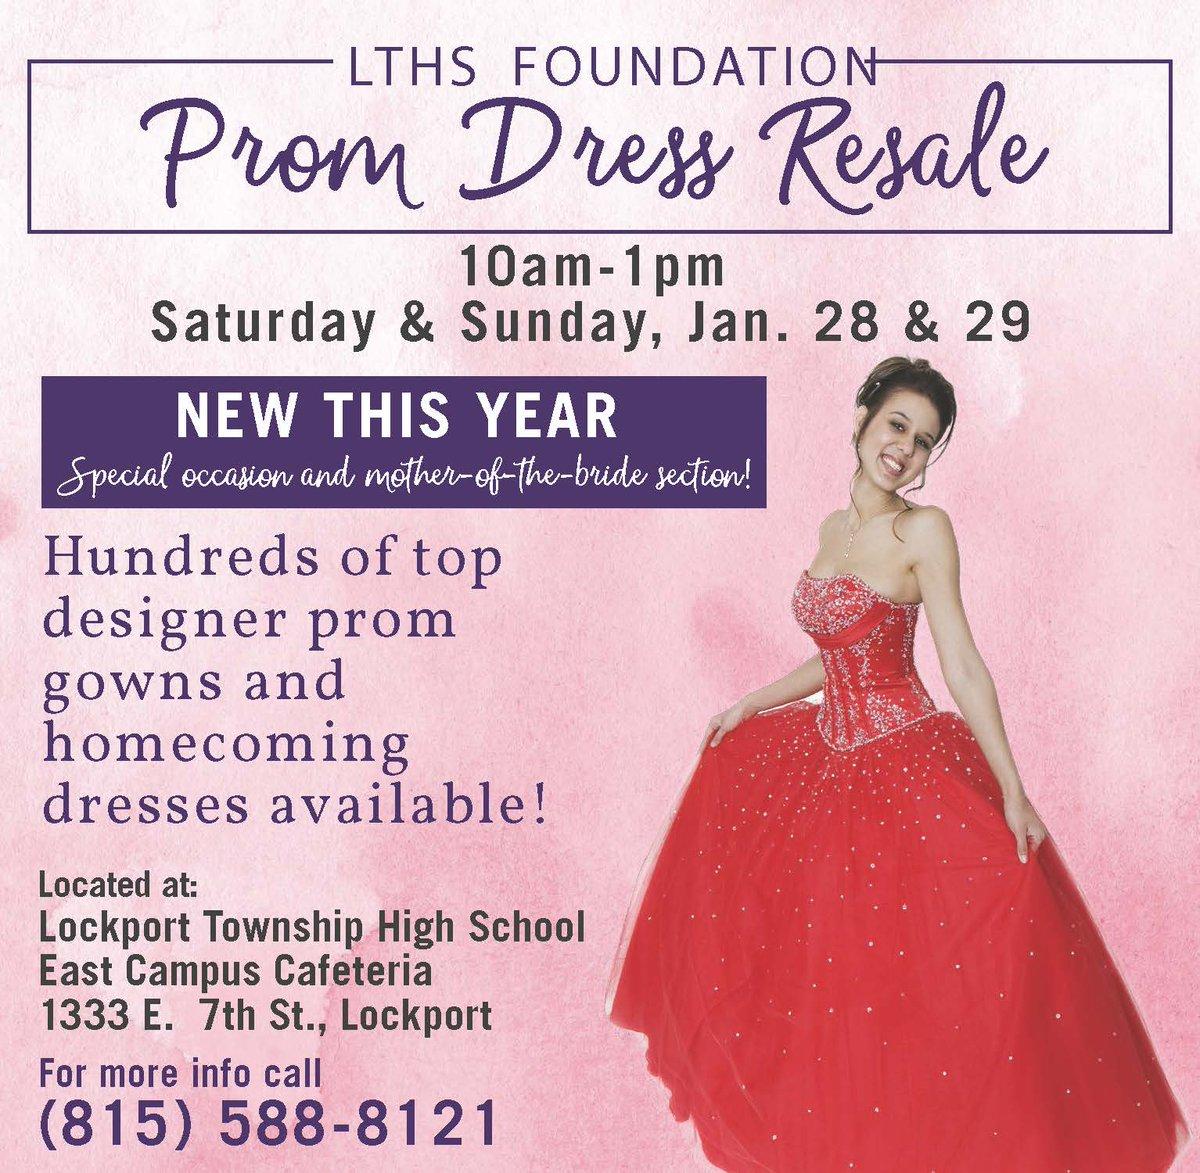 Prom dress resale 4 kids